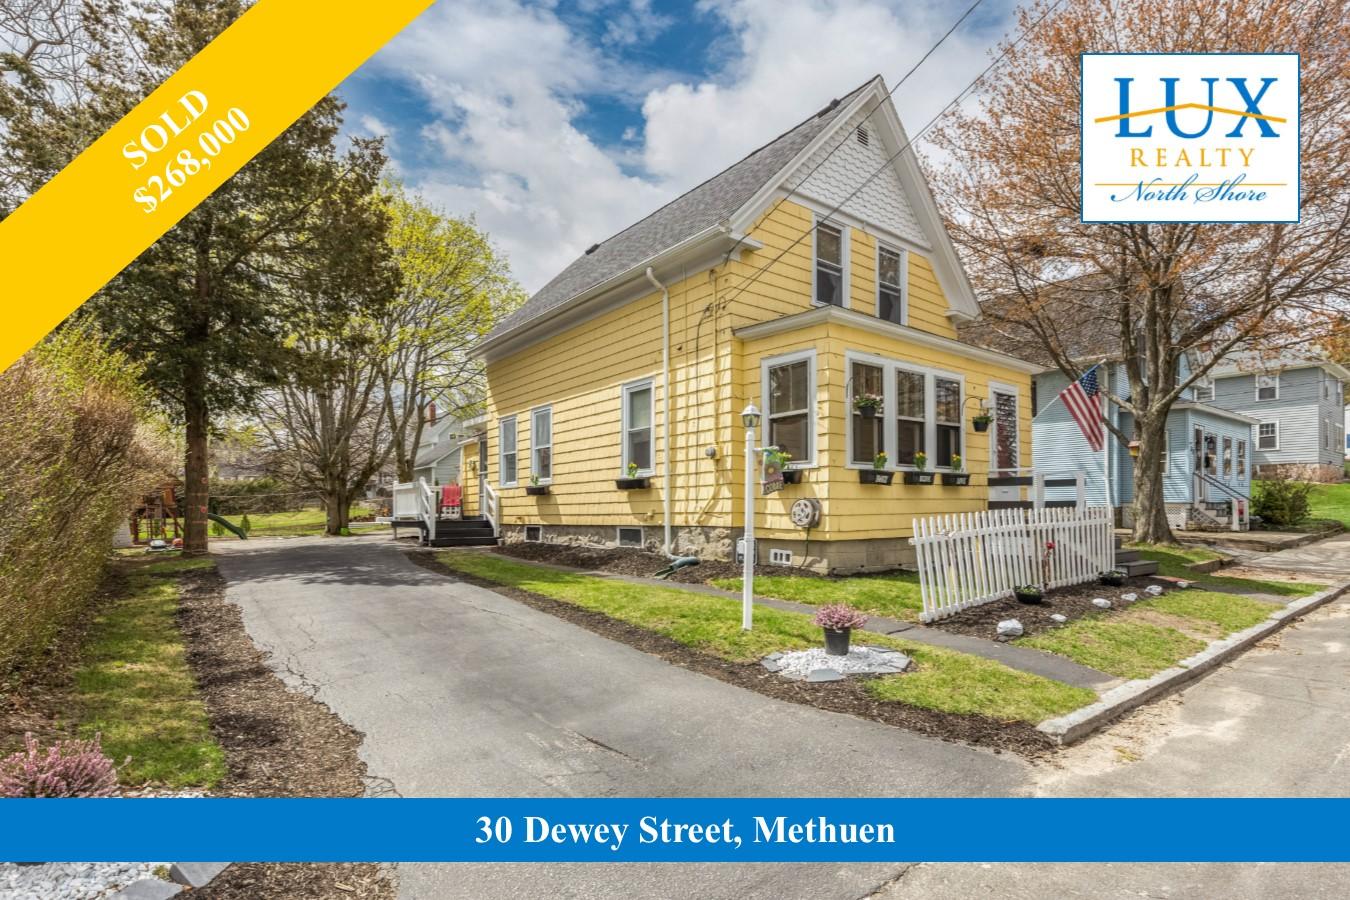 Dewey Street Methuen MA